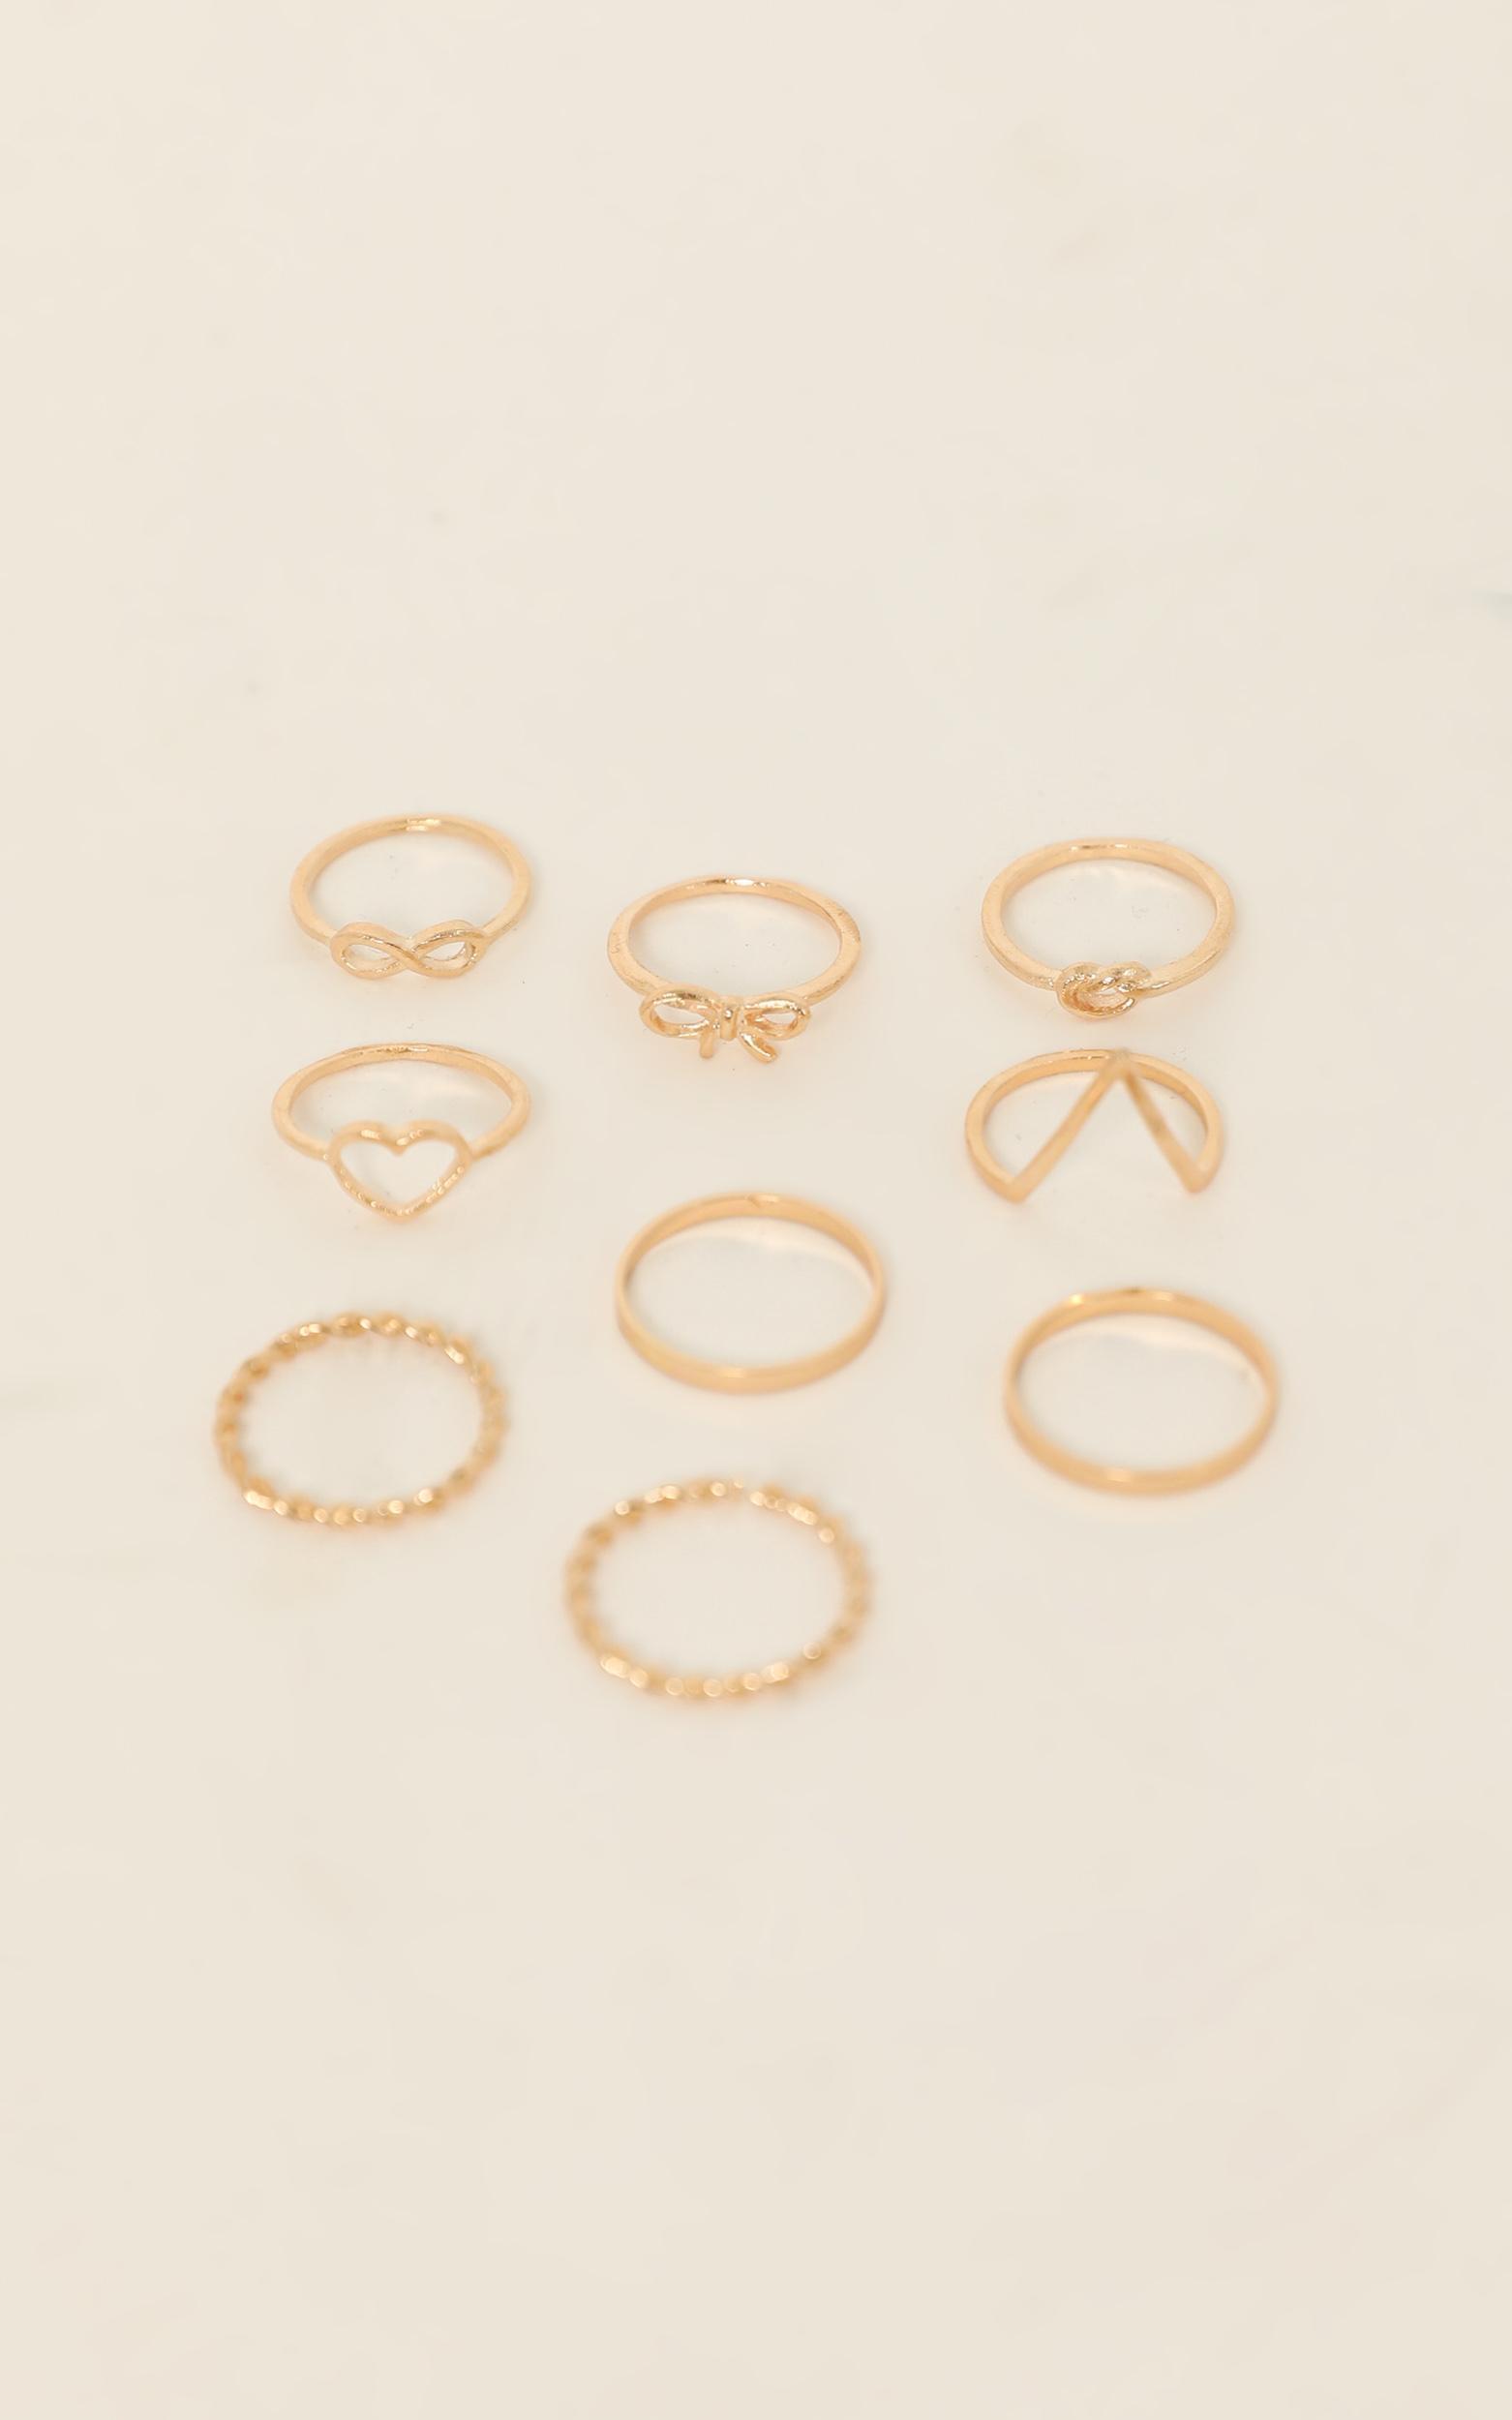 Longest Goodbye Ring Set in Gold, , hi-res image number null